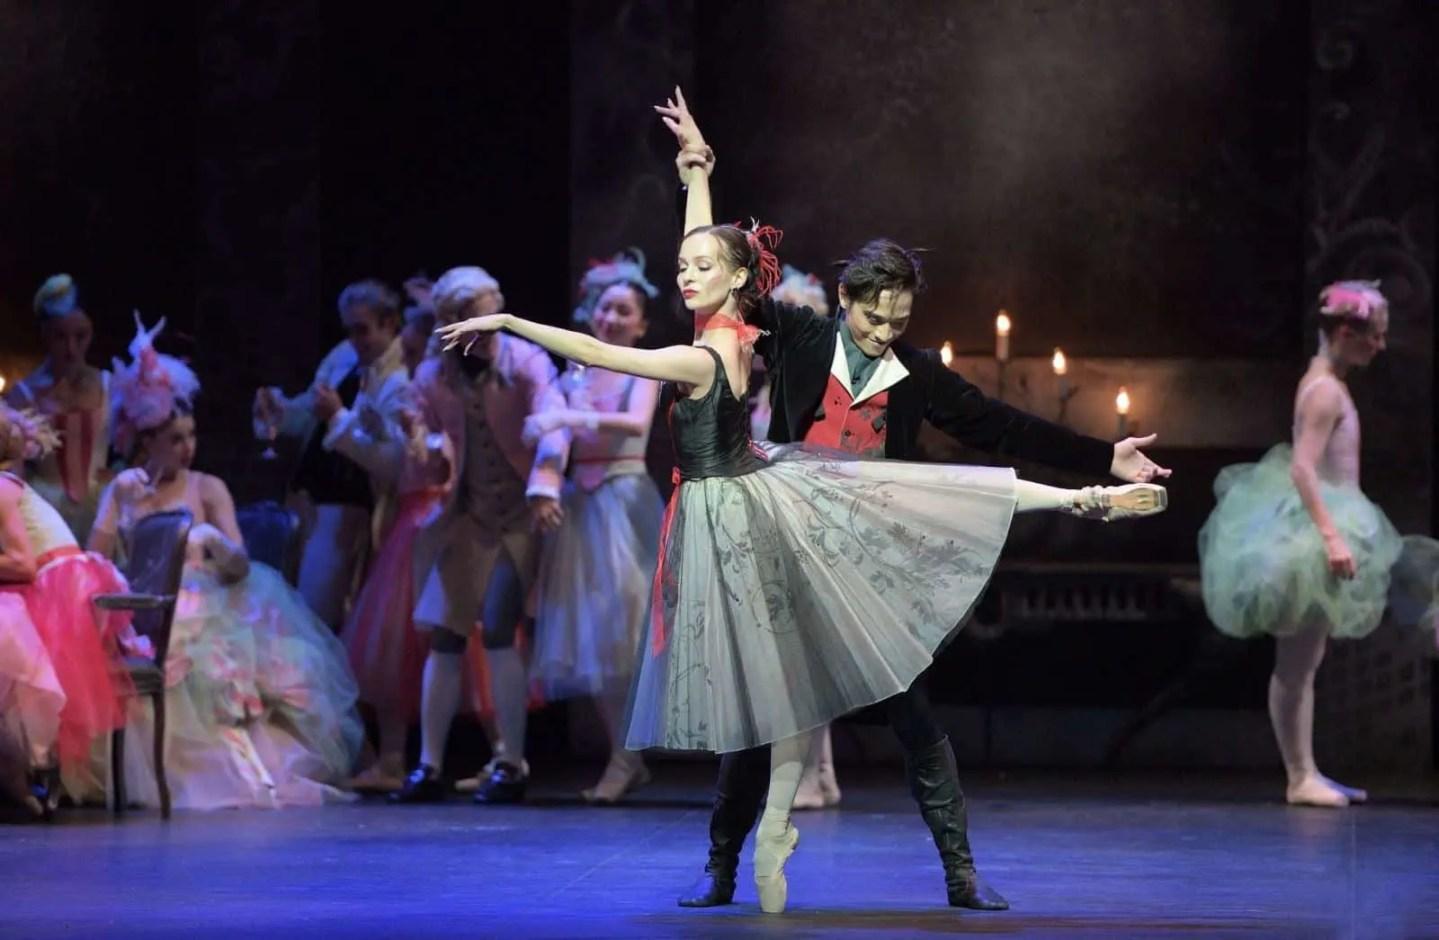 Katja-Khaniukova-and-Jeffrey-Cirio-in-Manon-c-Laurent-Liotardo